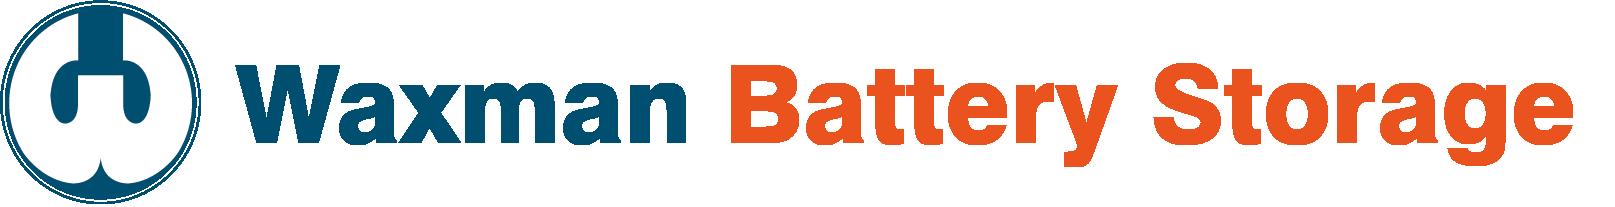 Waxman Battery Storage